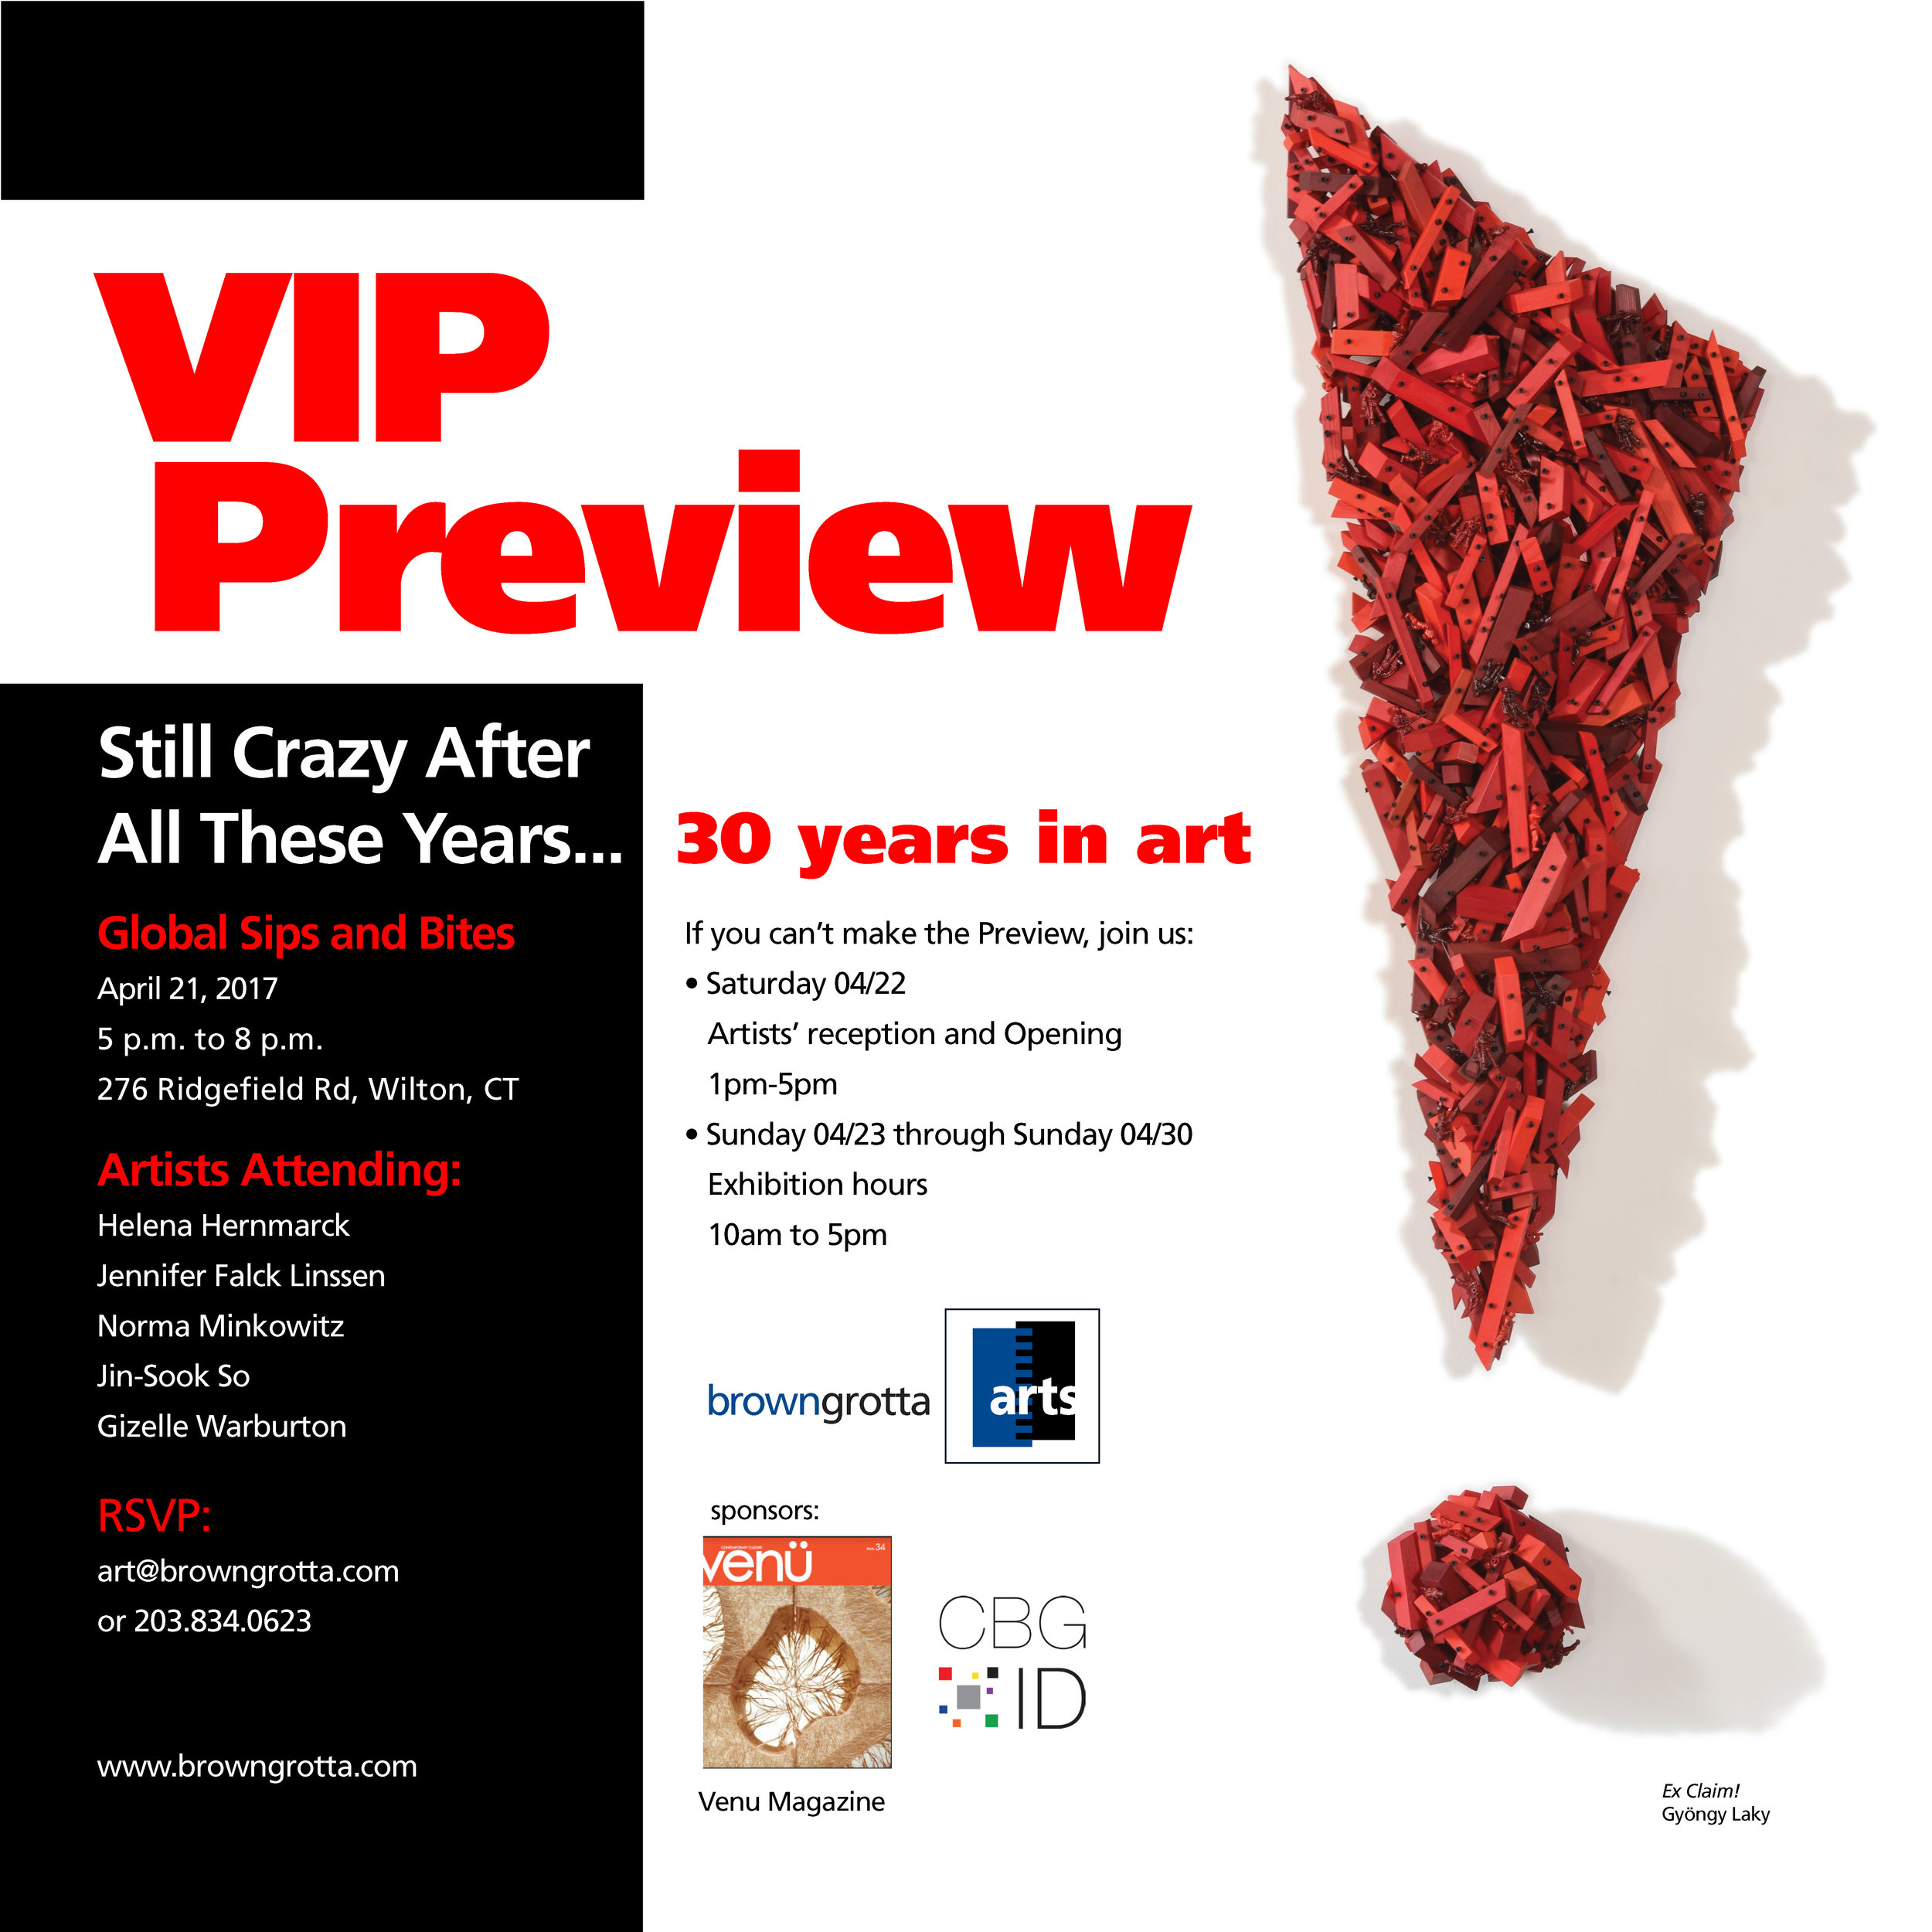 VIP PREVIEW INVITE.2.jpg